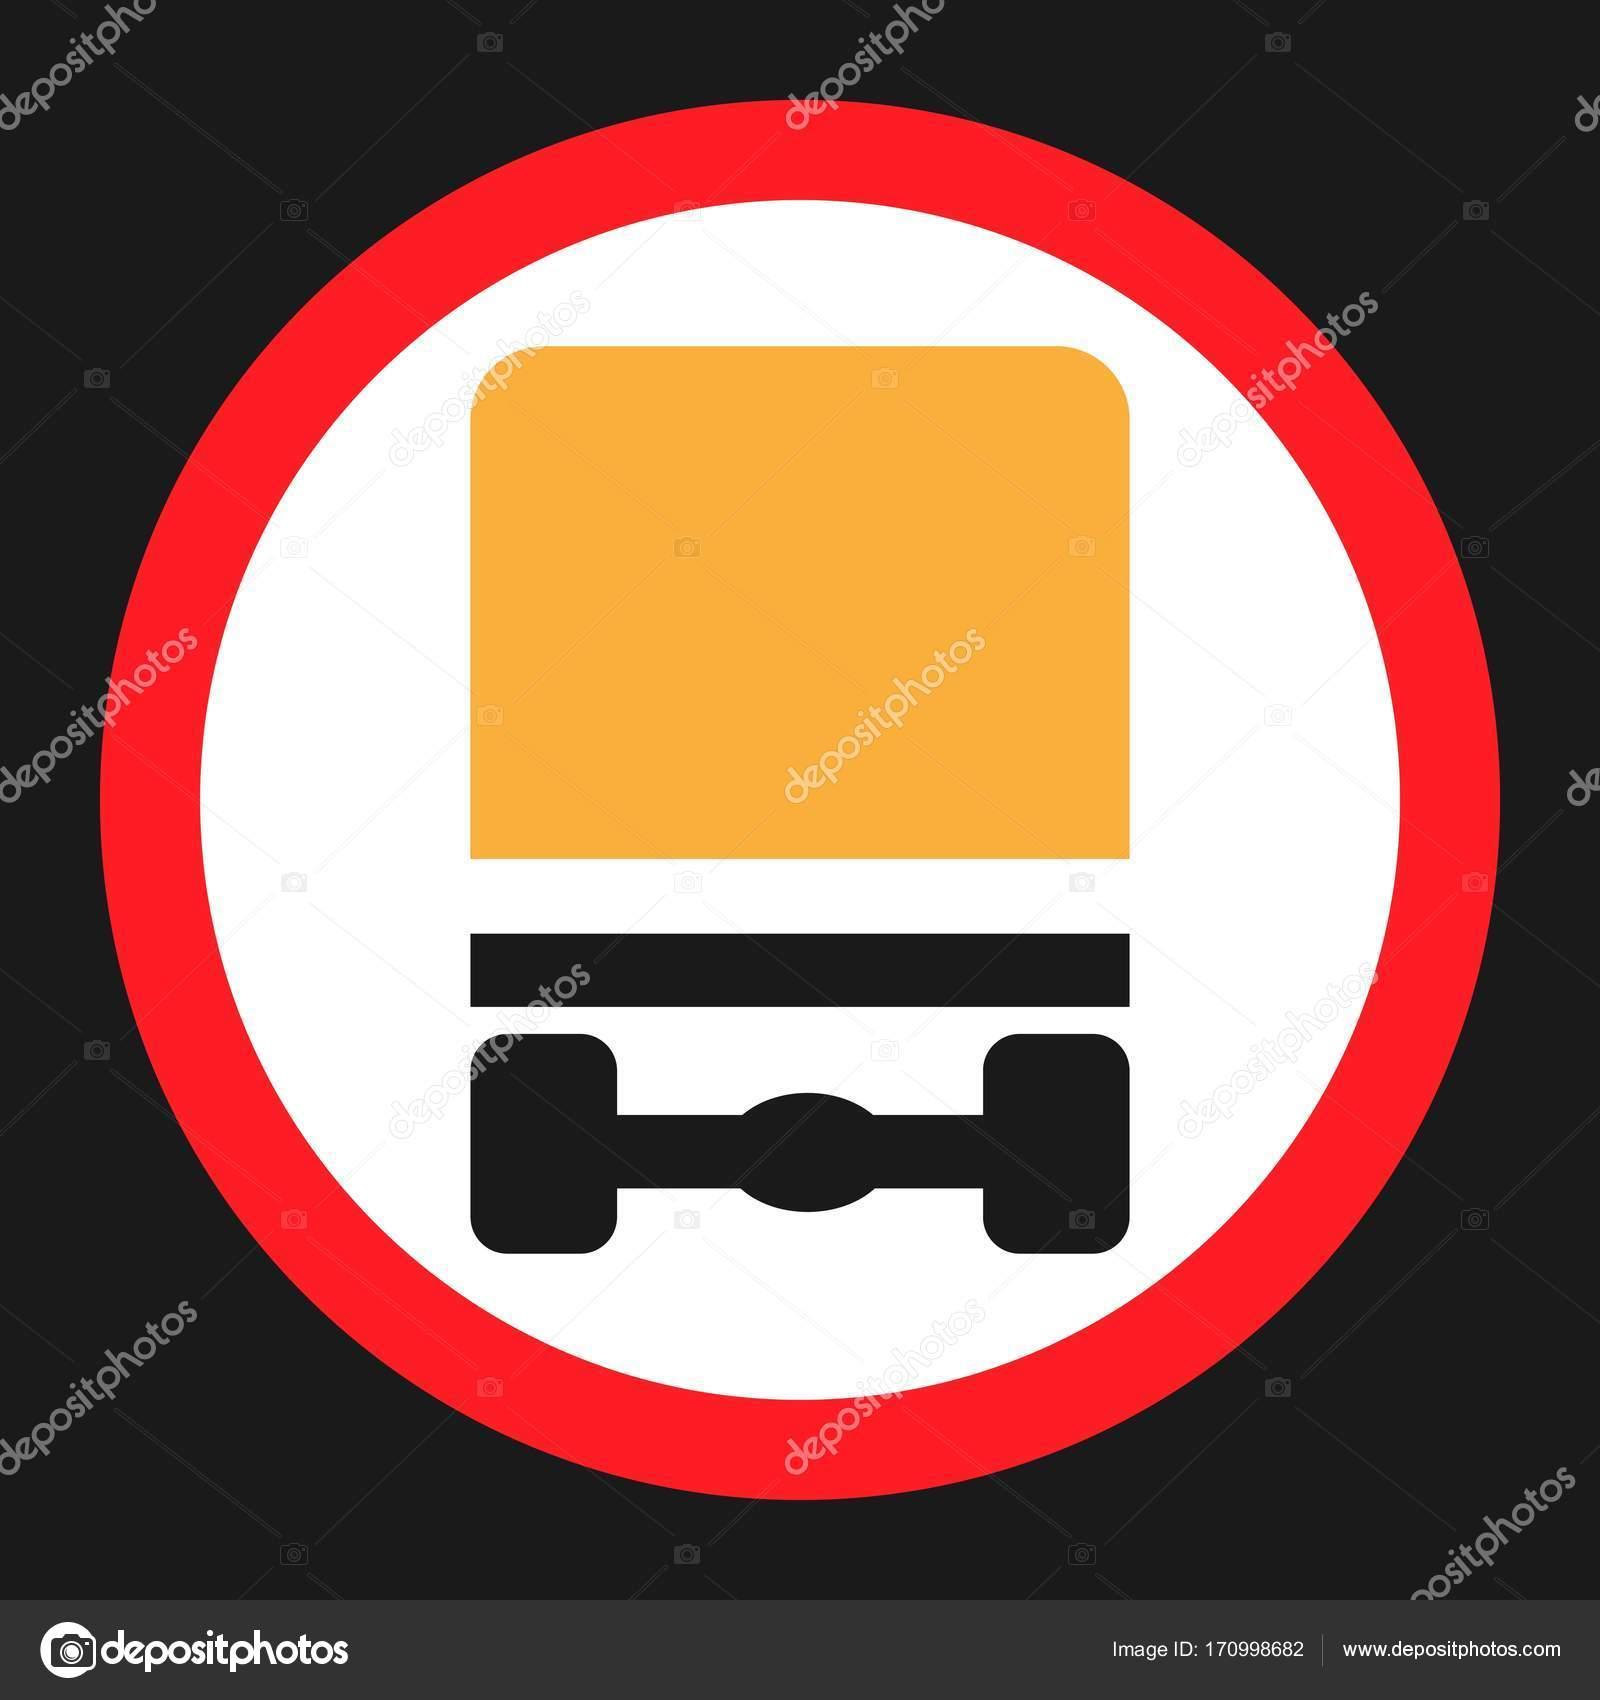 Dangerous Goods Transport Prohibition Sign Icon Stock Vector